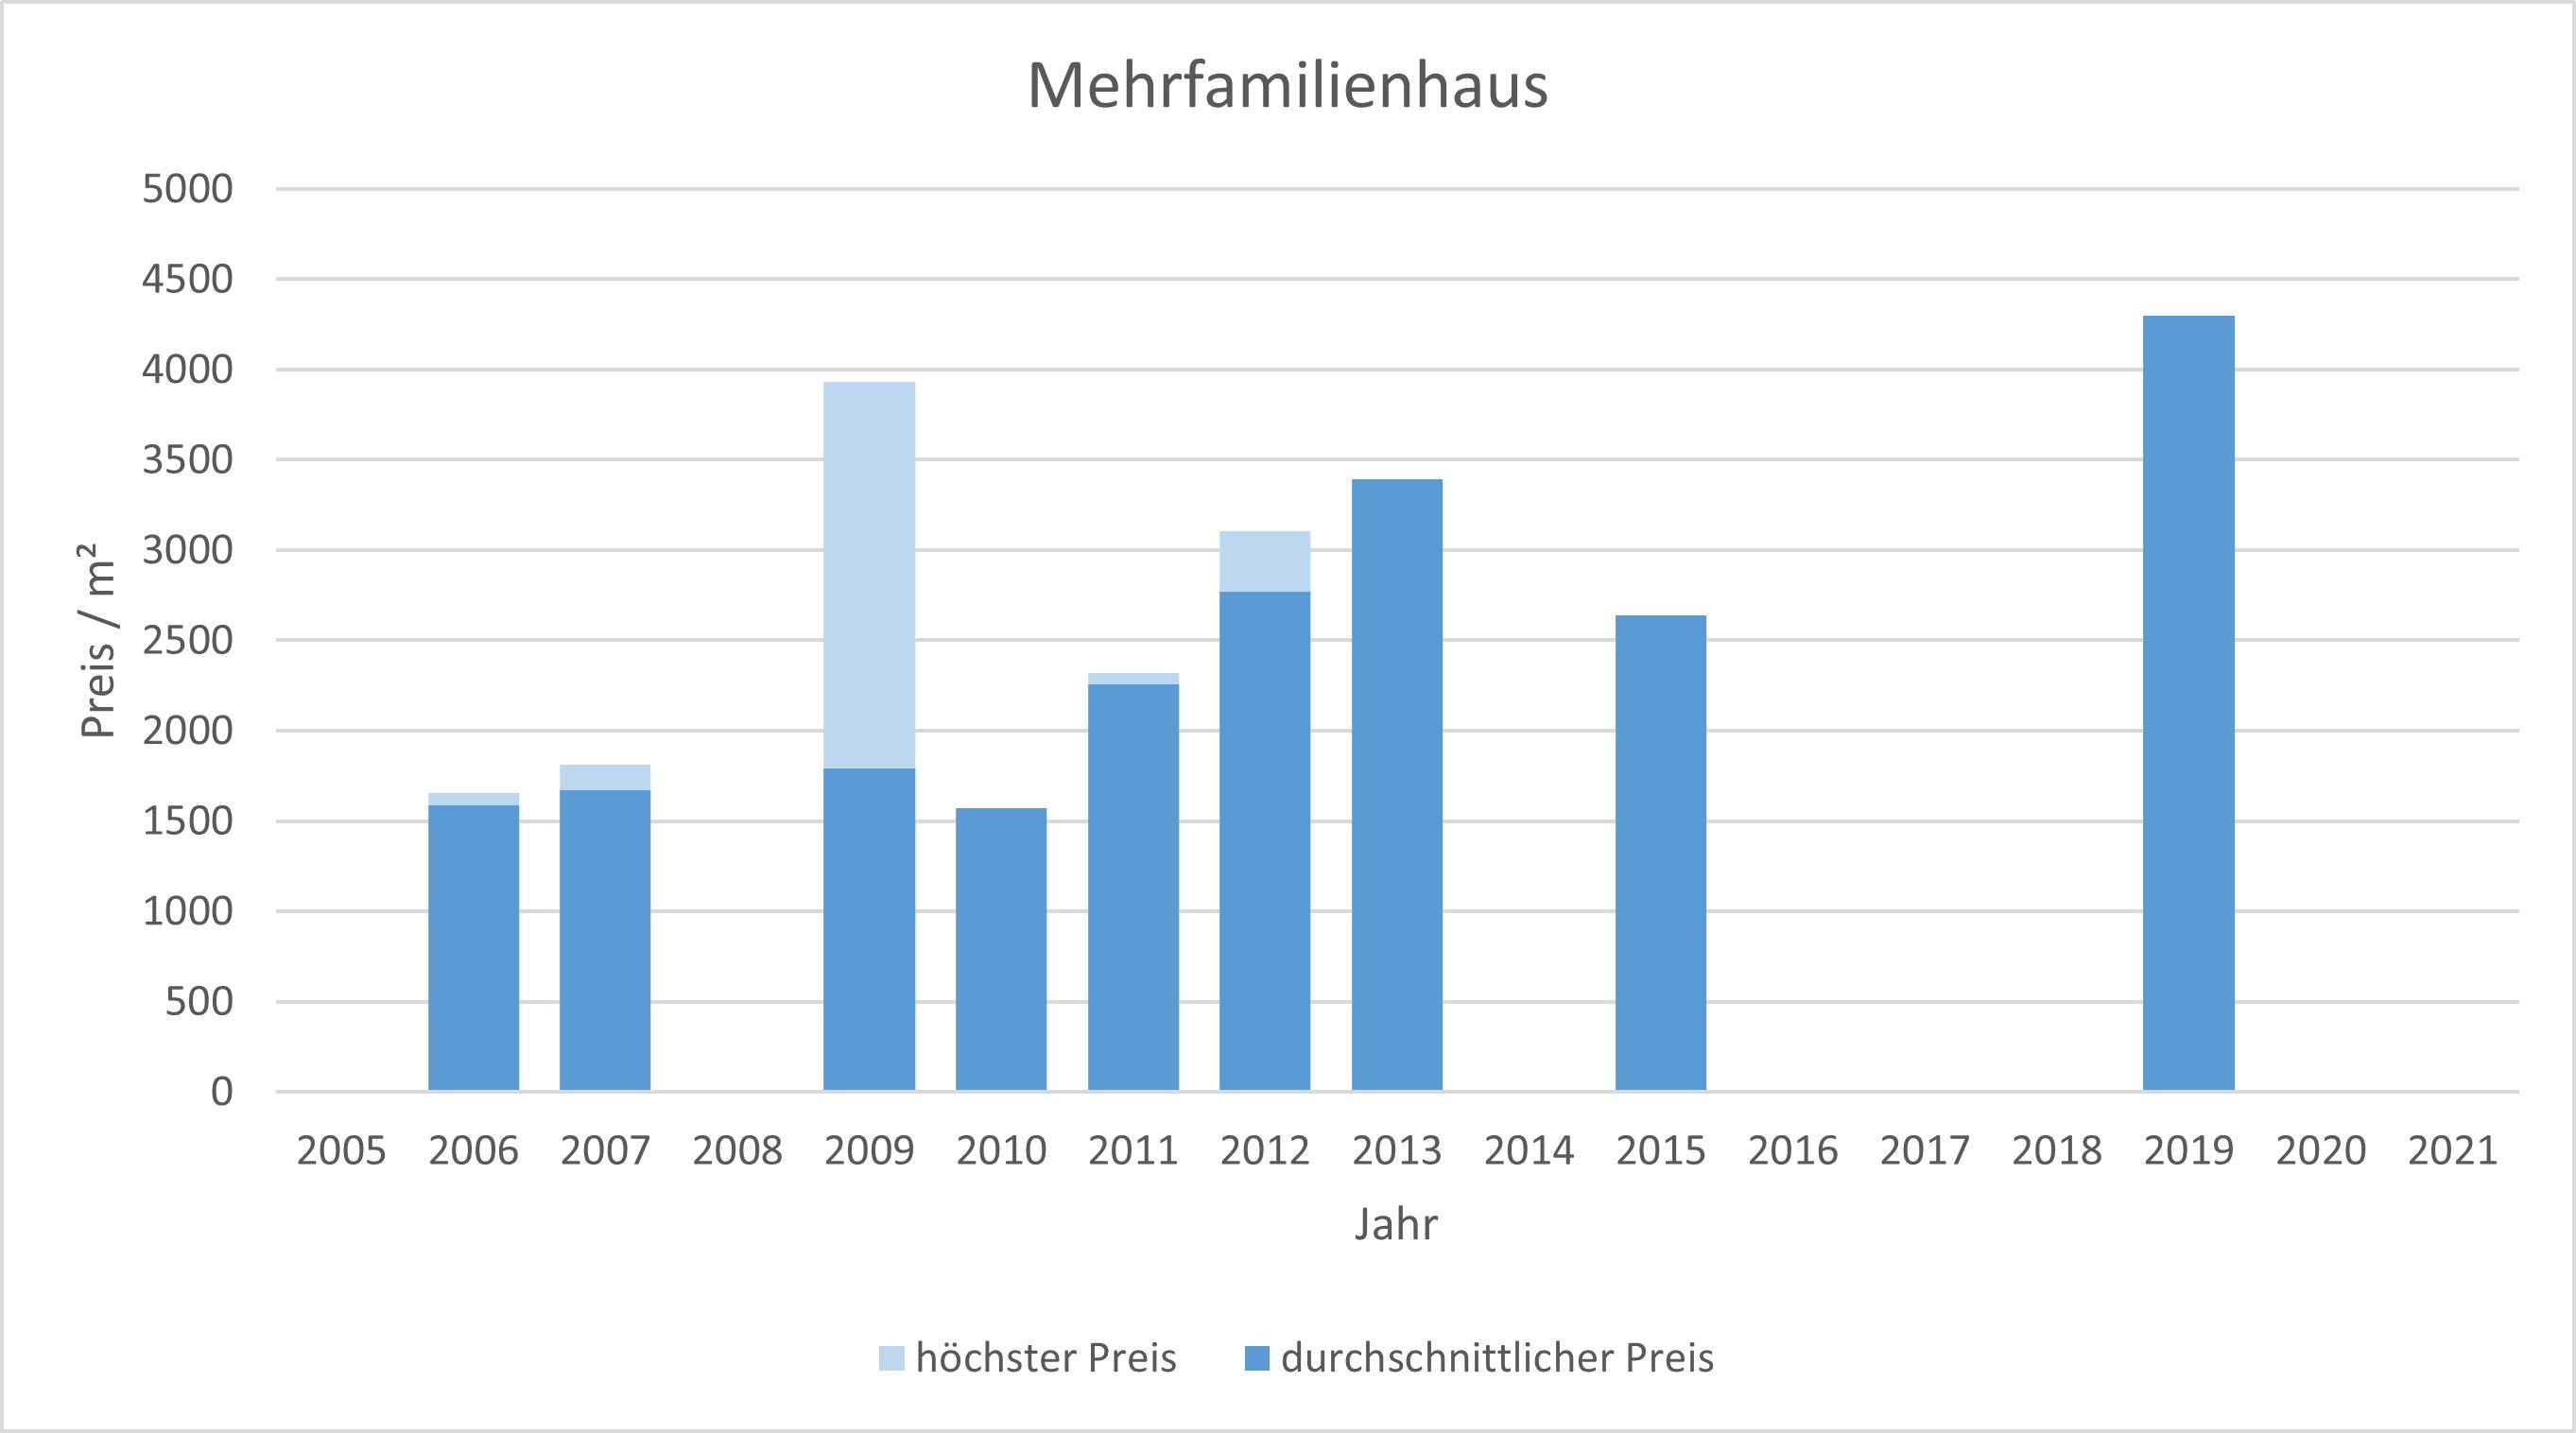 Moosach bei Ebersberg Mehrfamilienhaus kaufen verkaufen Preis Bewertung Makler  2019 2020 2021 www.happy-immo.de